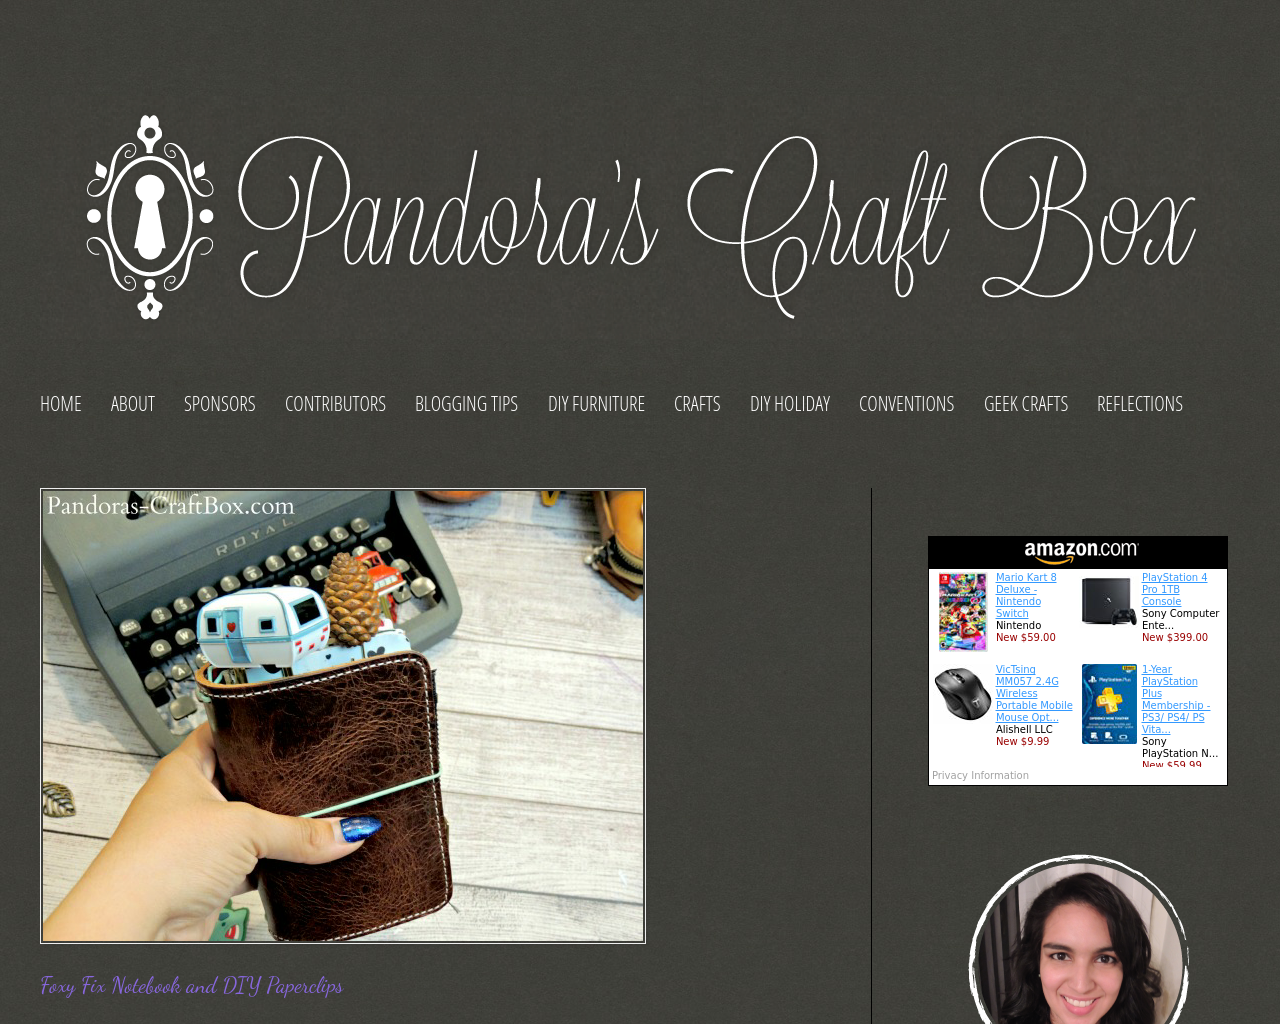 Pandora's-Craft-Box-Advertising-Reviews-Pricing